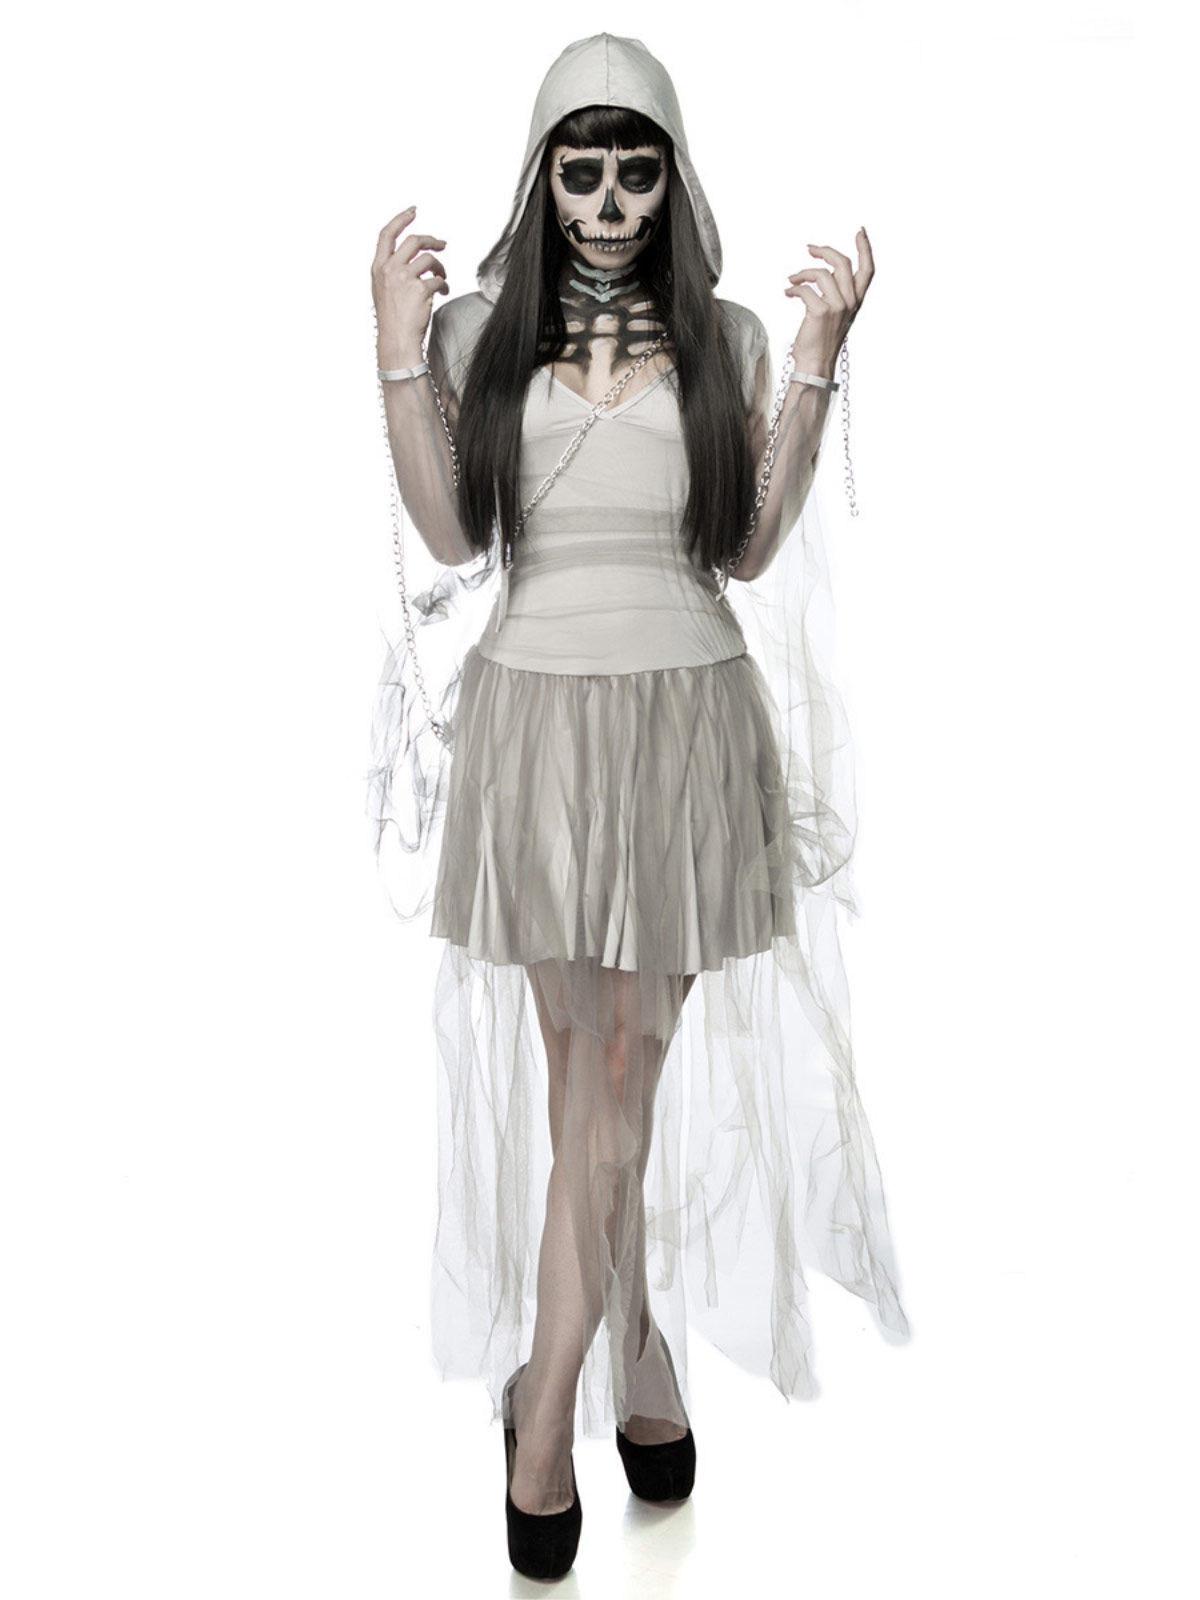 geister-frau halloween-damenkostüm komplettset grau , günstige